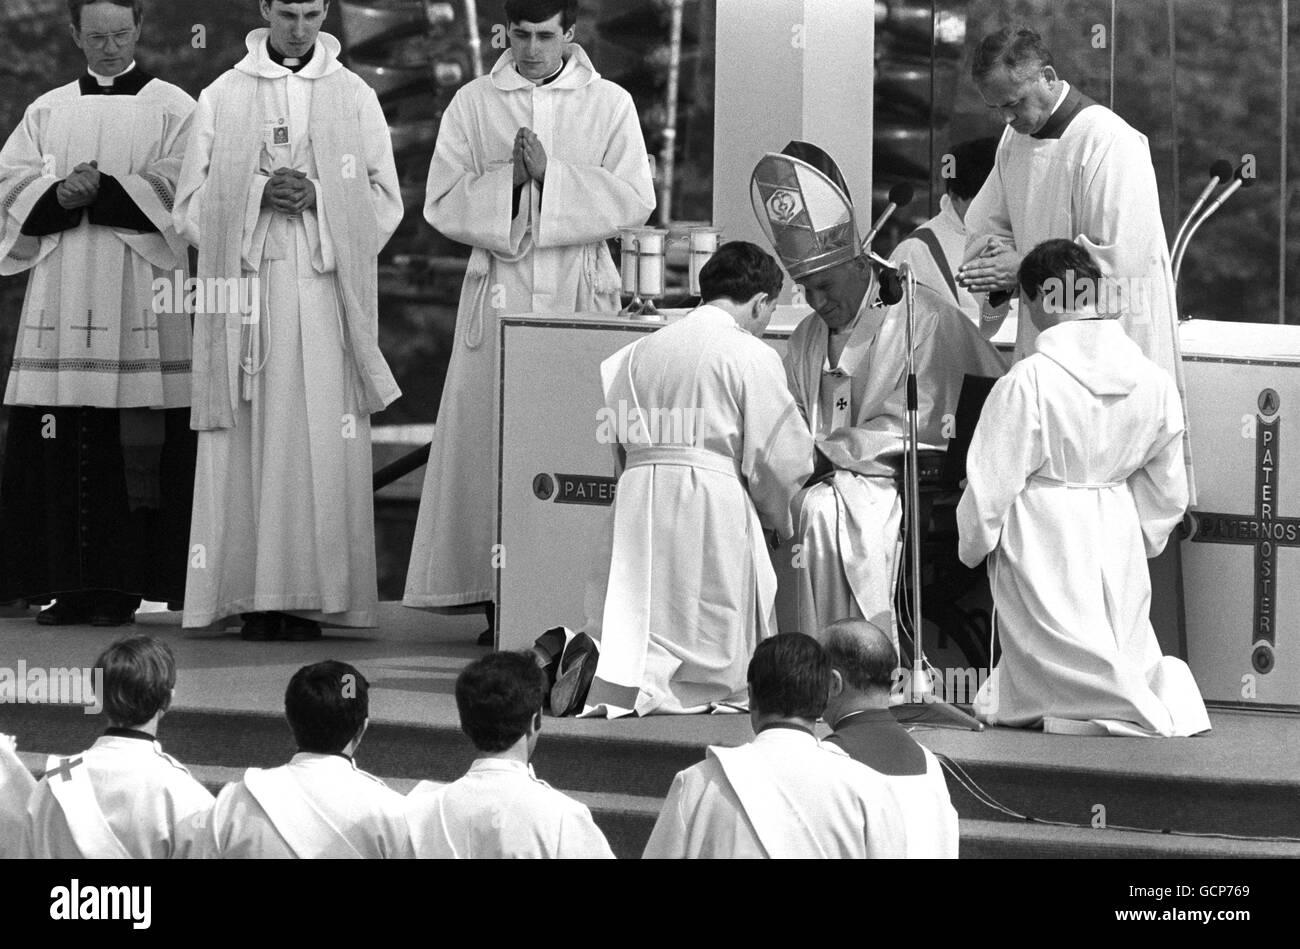 Religion - Pope John Paul II Visit to Britain - Manchester Stock Photo